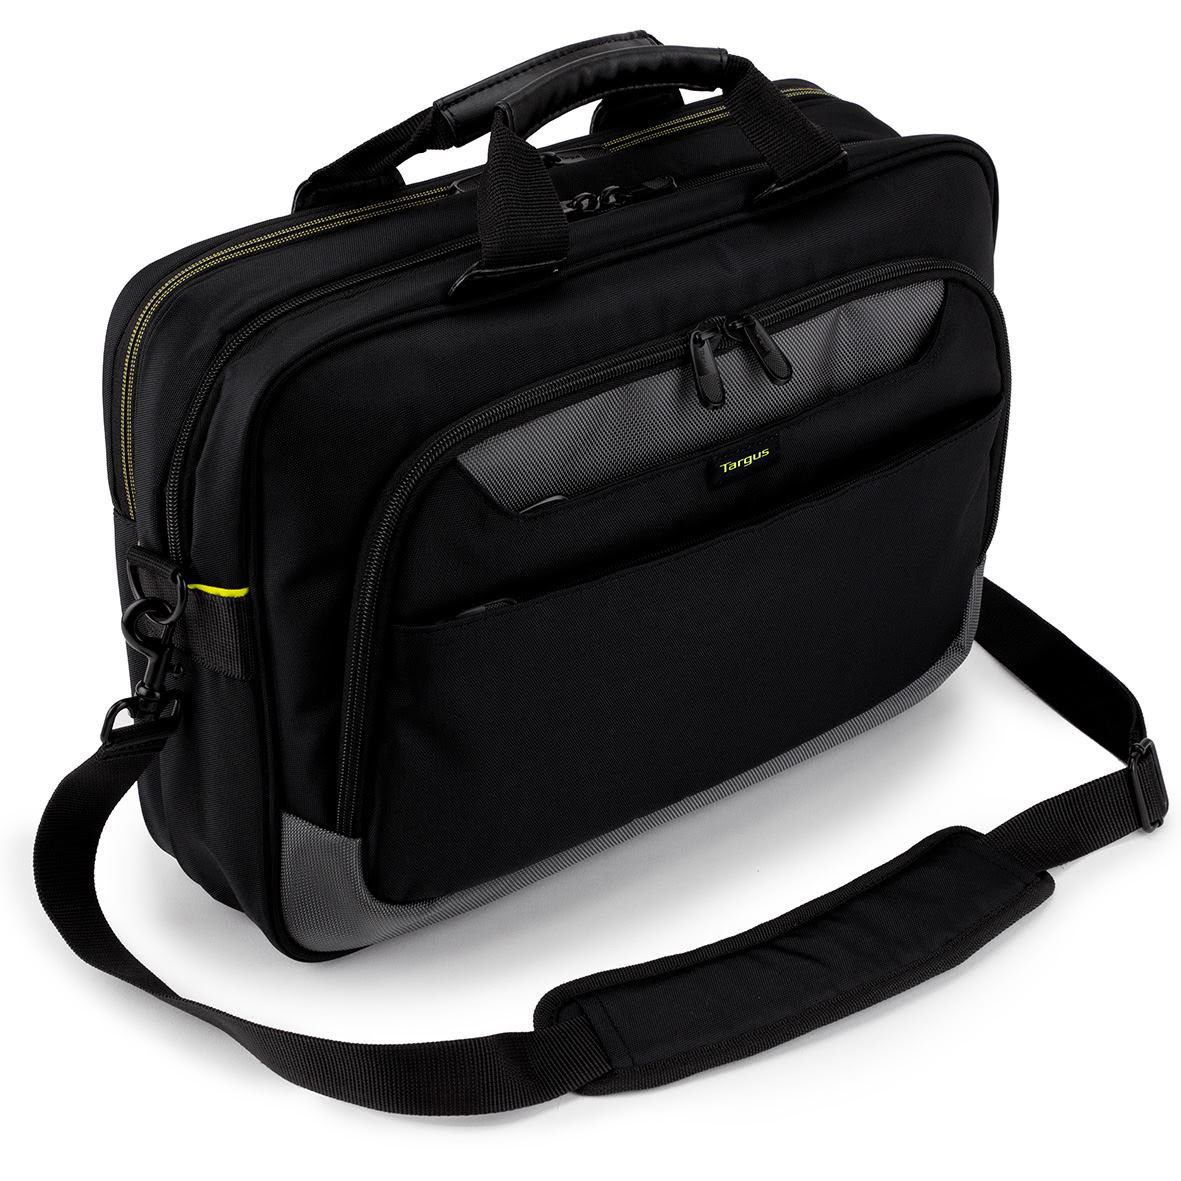 "TCG470EU CityGear 15-17.3"" Topload Laptop Case Targus - 0"